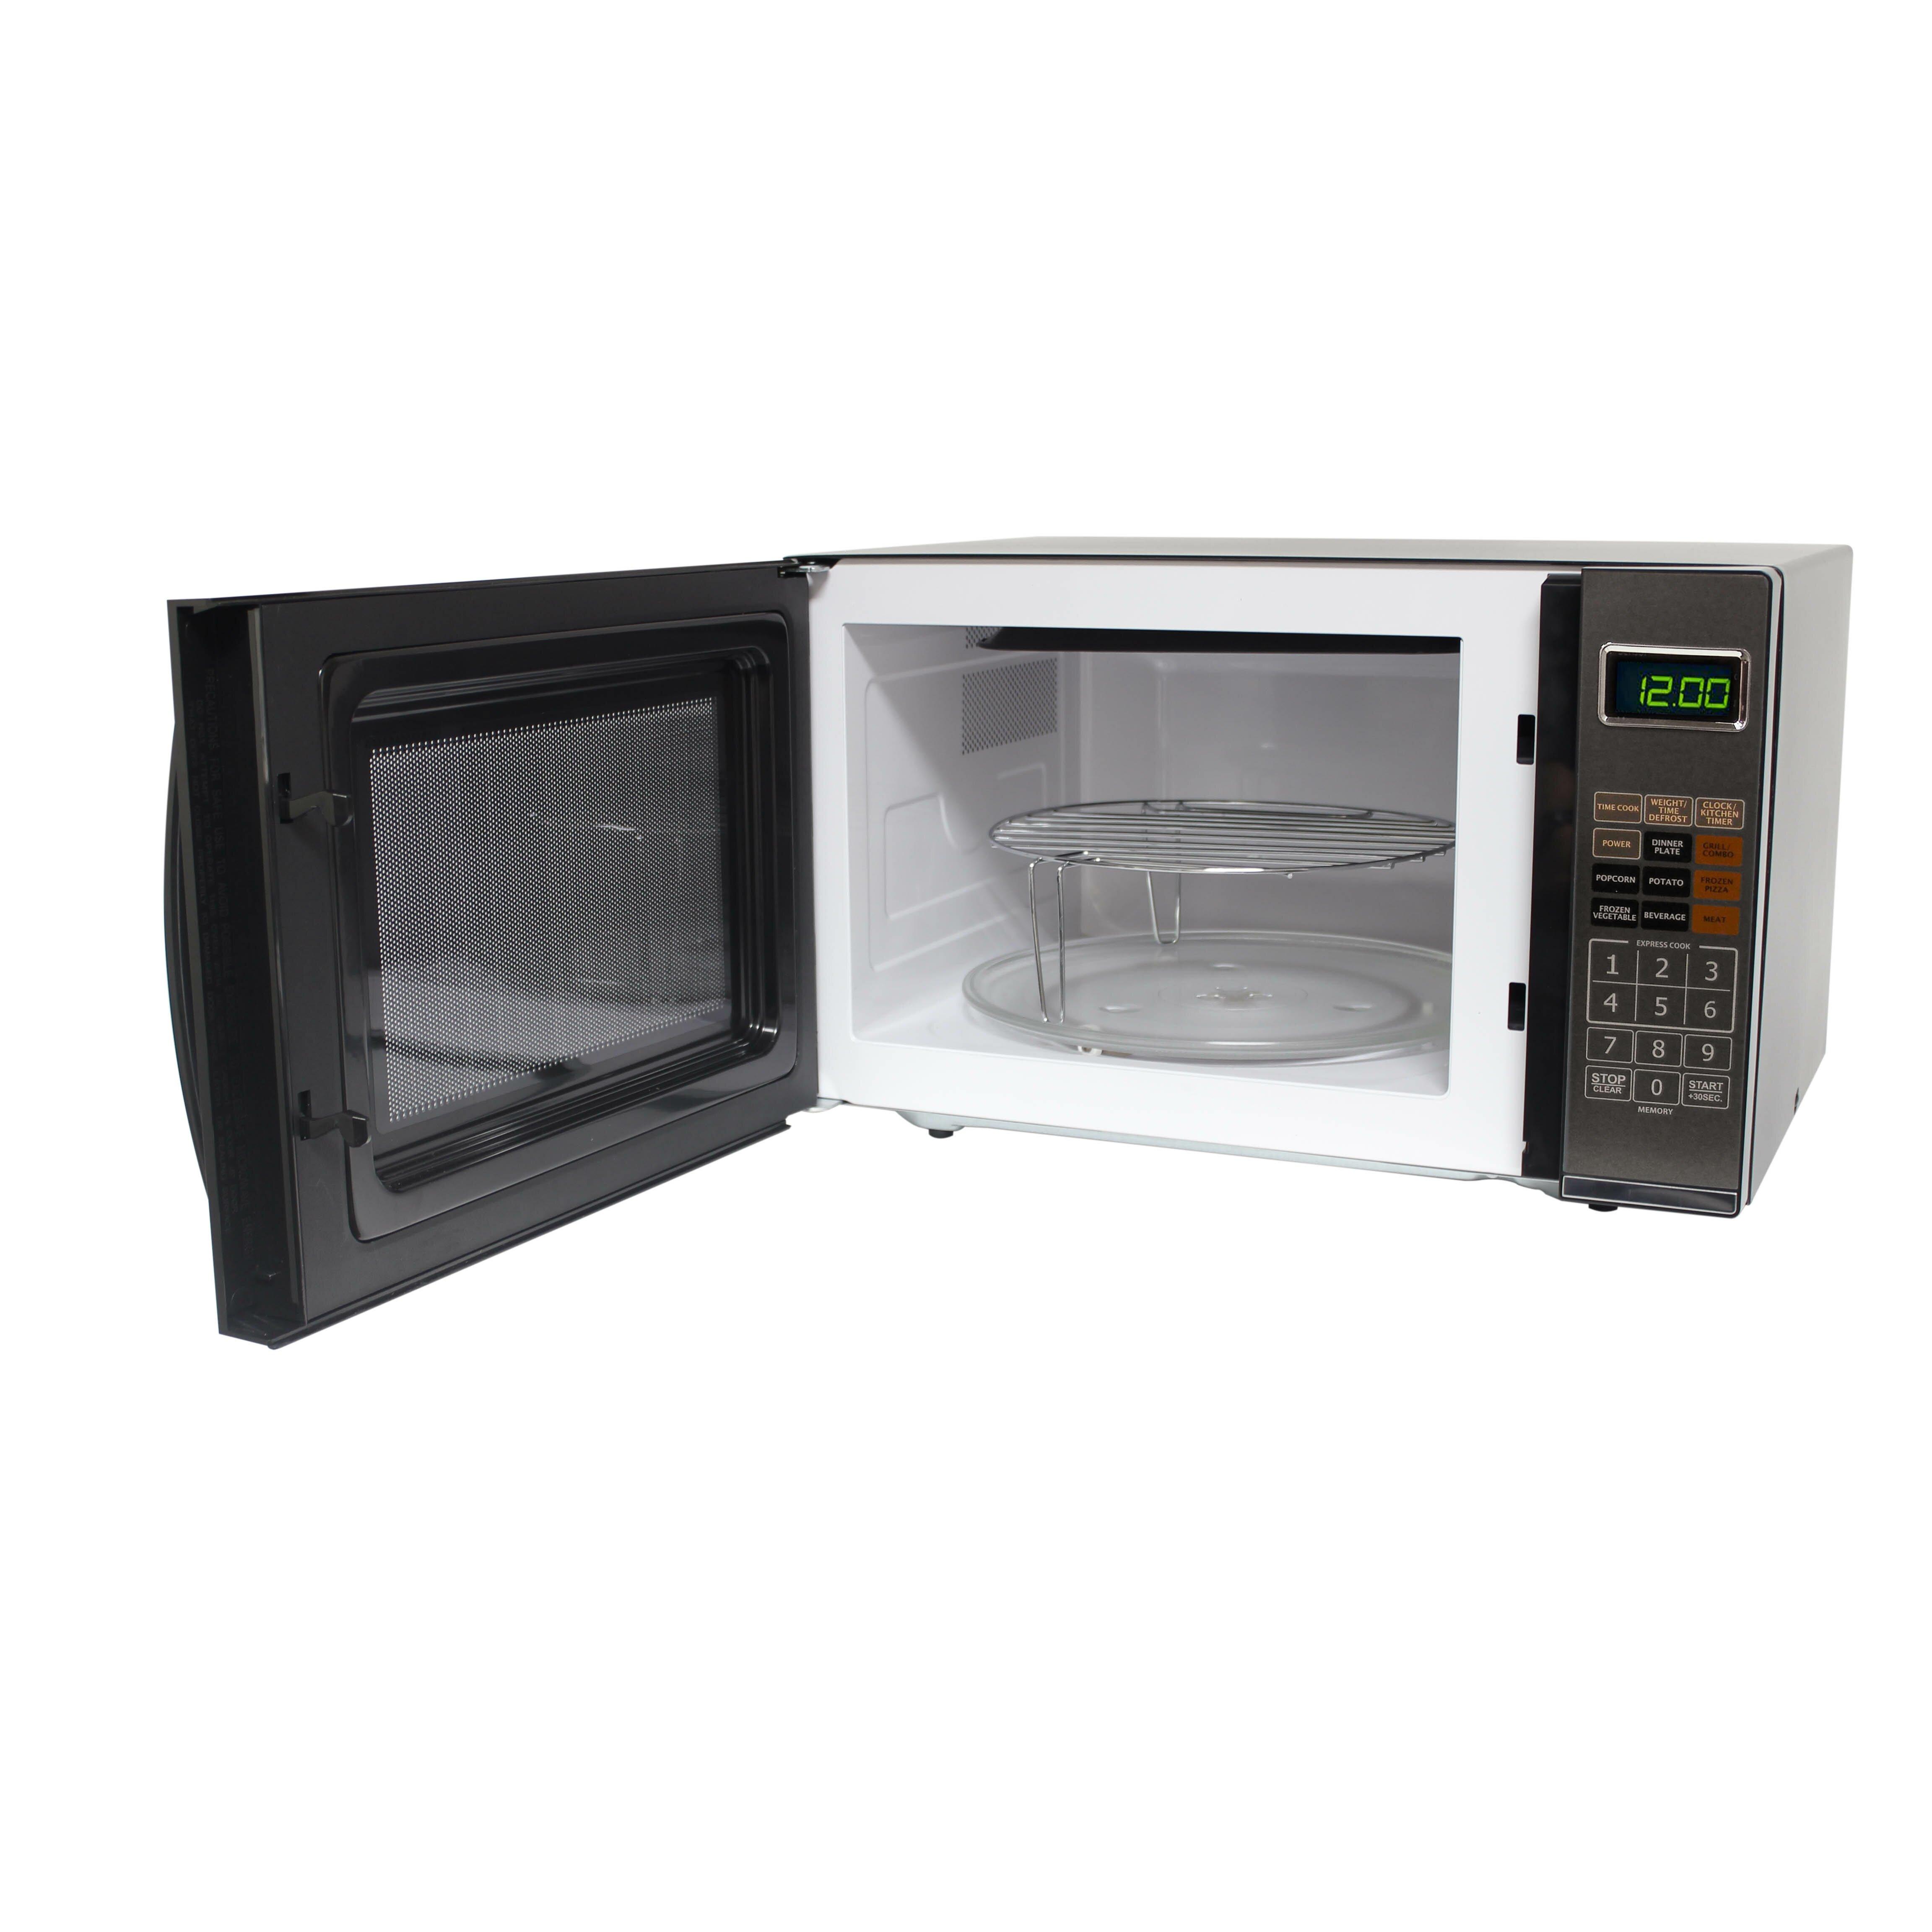 Emerson Countertop Microwave : Emerson Radio 1.2 Cu. Ft. 1100W Countertop Microwave & Reviews ...